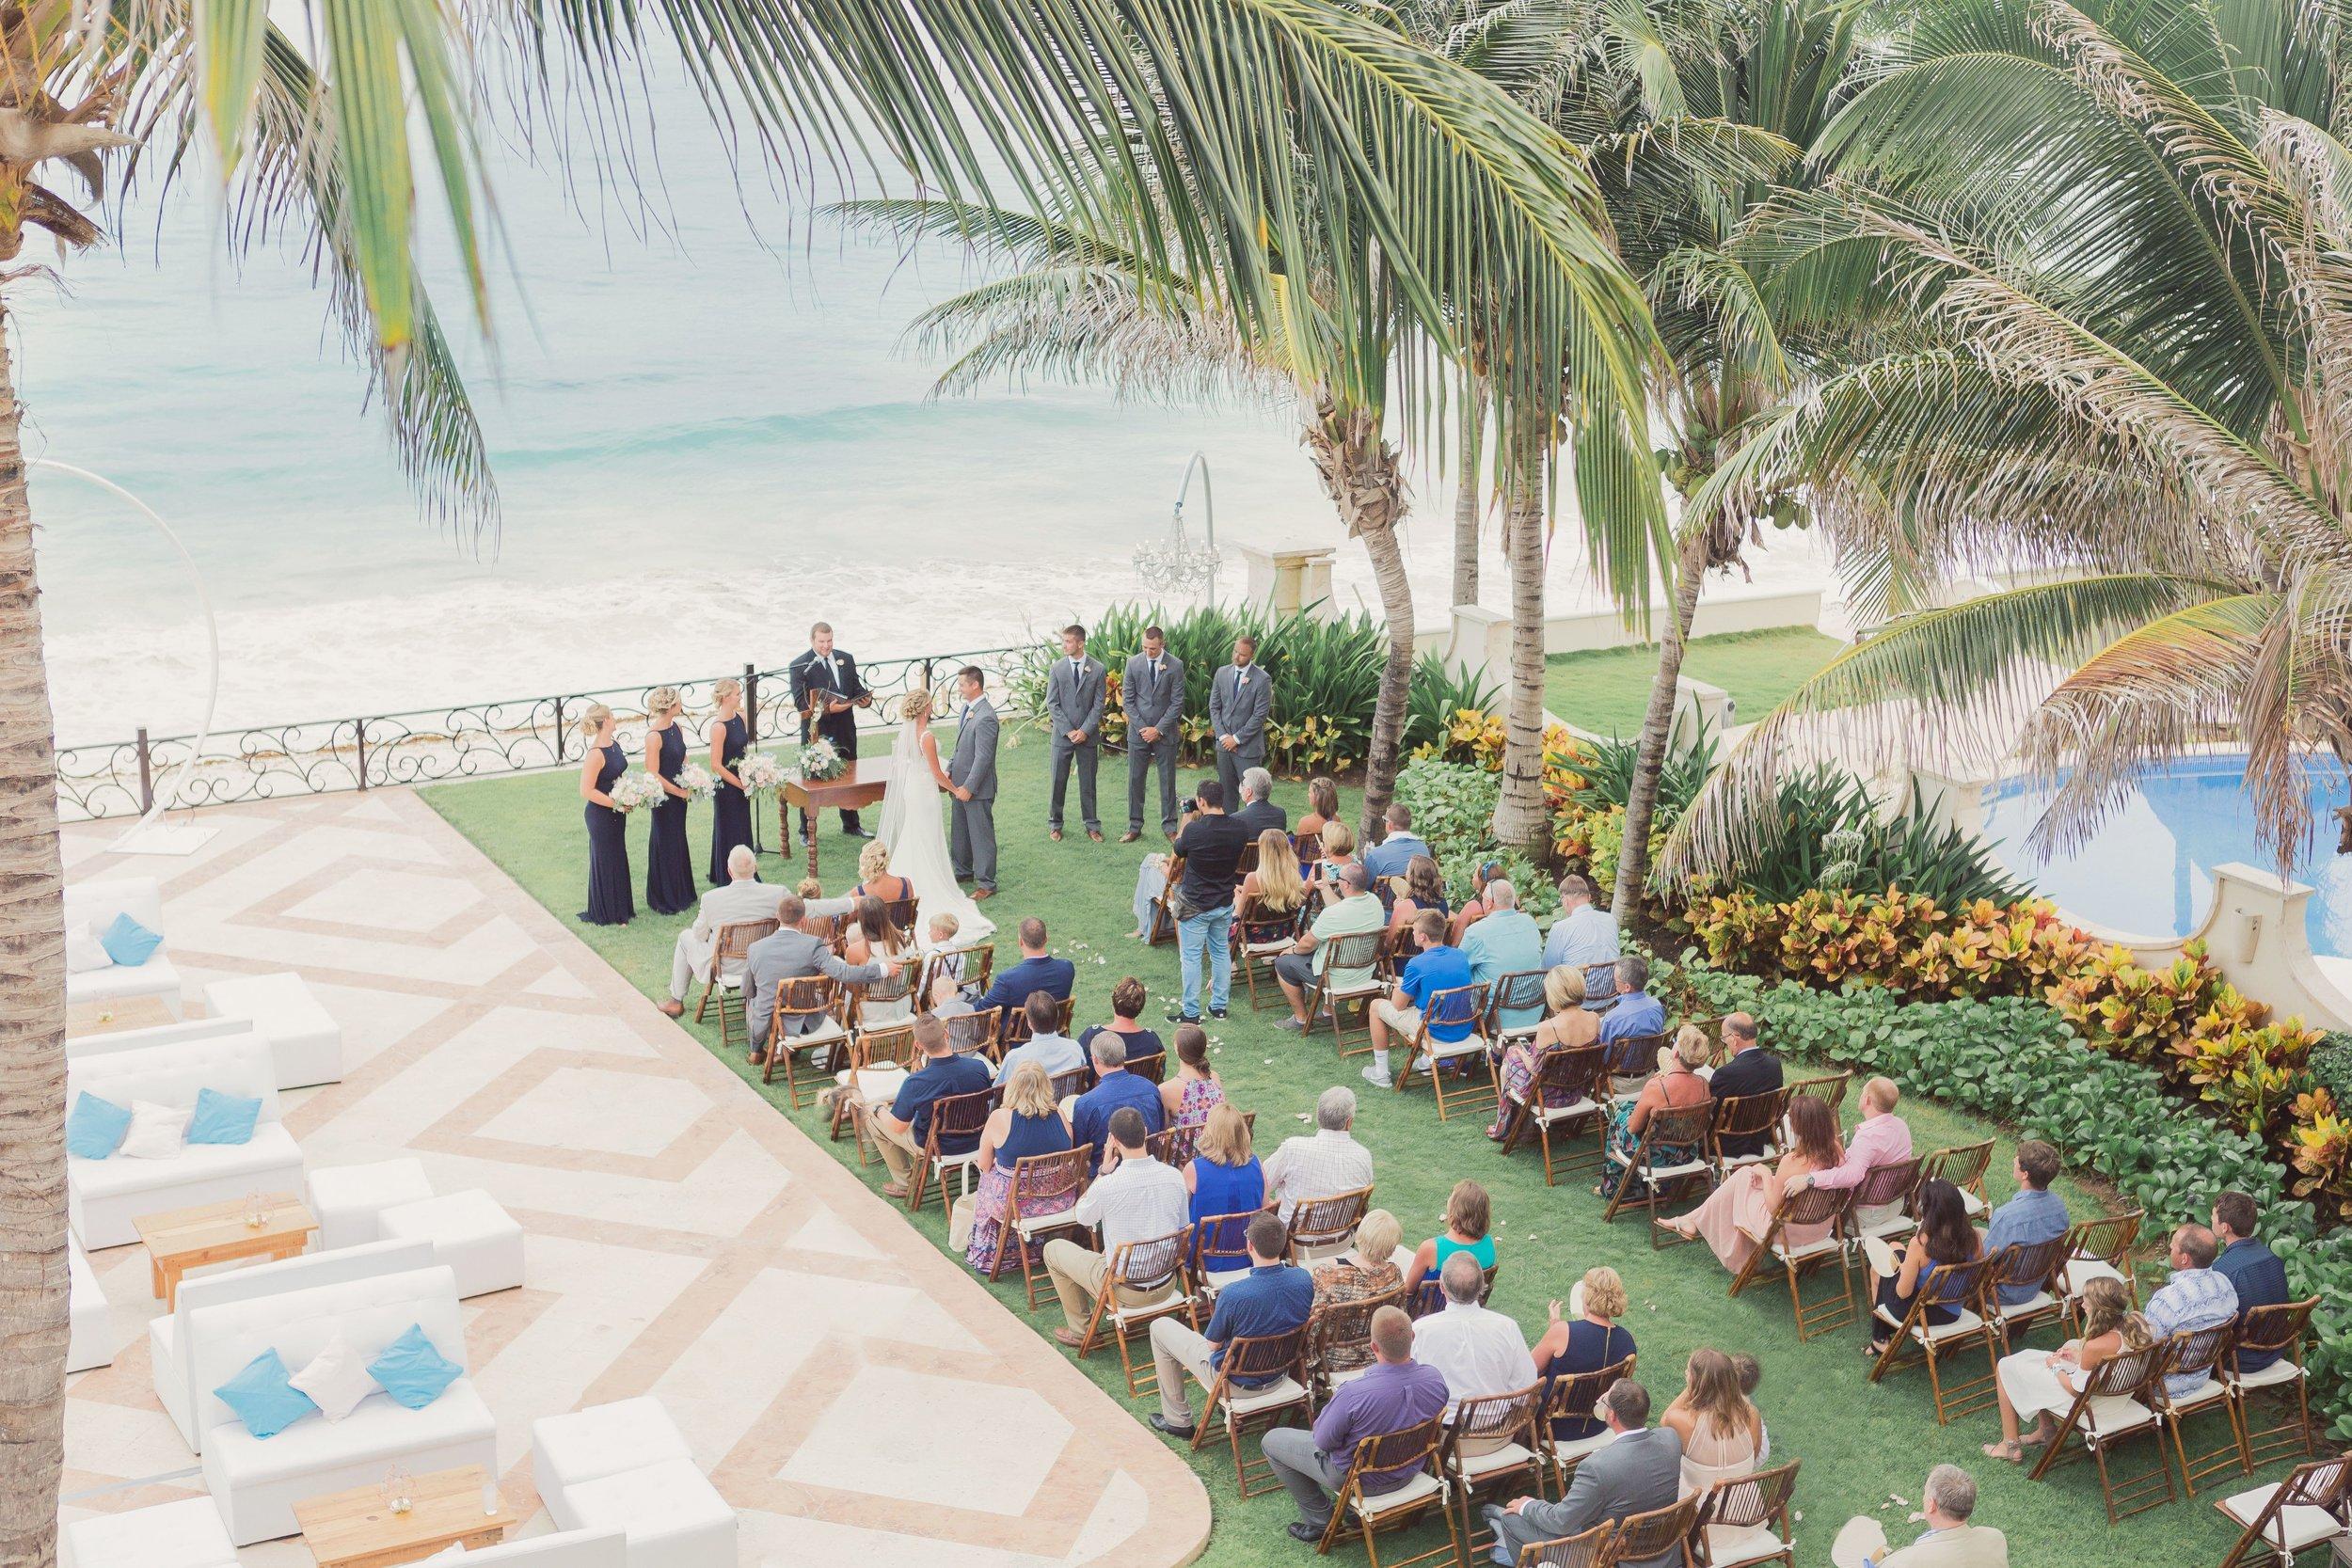 cancun-wedding-venue-villa-la-joya-923 copy-websize.jpg